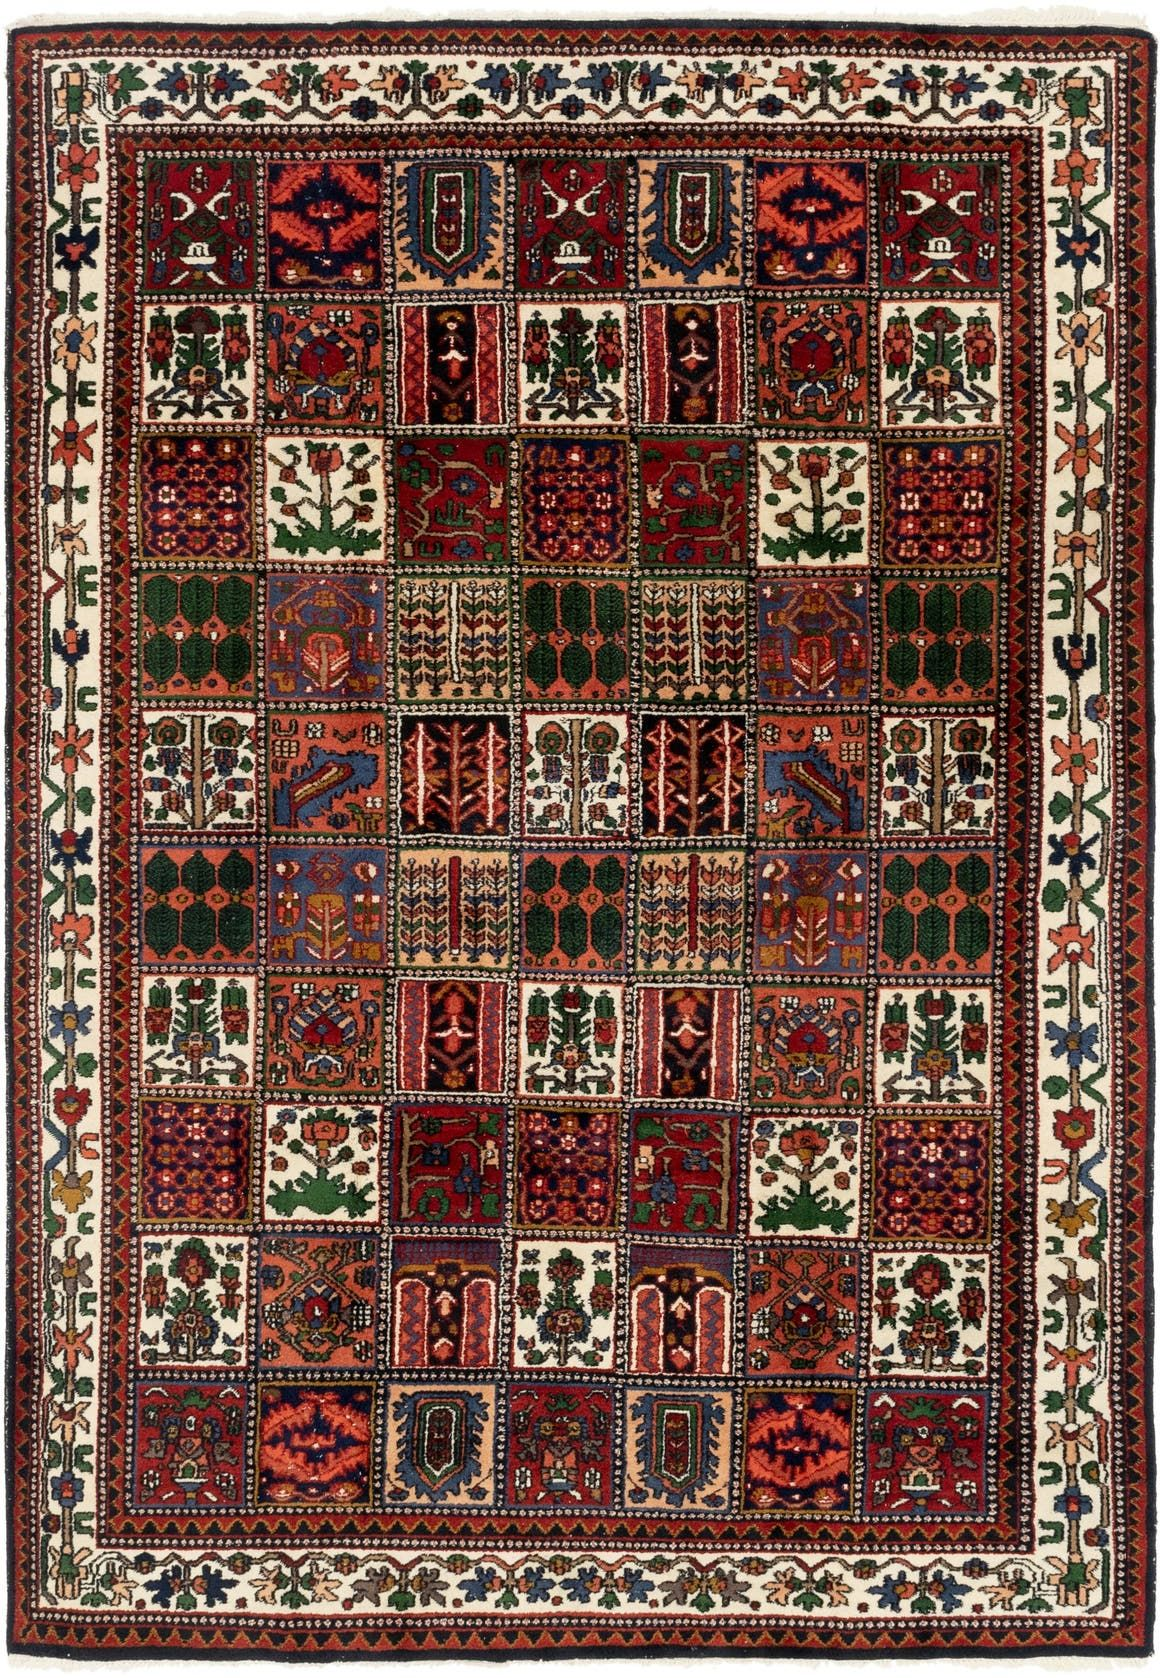 Bakhtiari Red 7x10 Area Rug In 2020 Rugs Rugs On Carpet Area Rugs